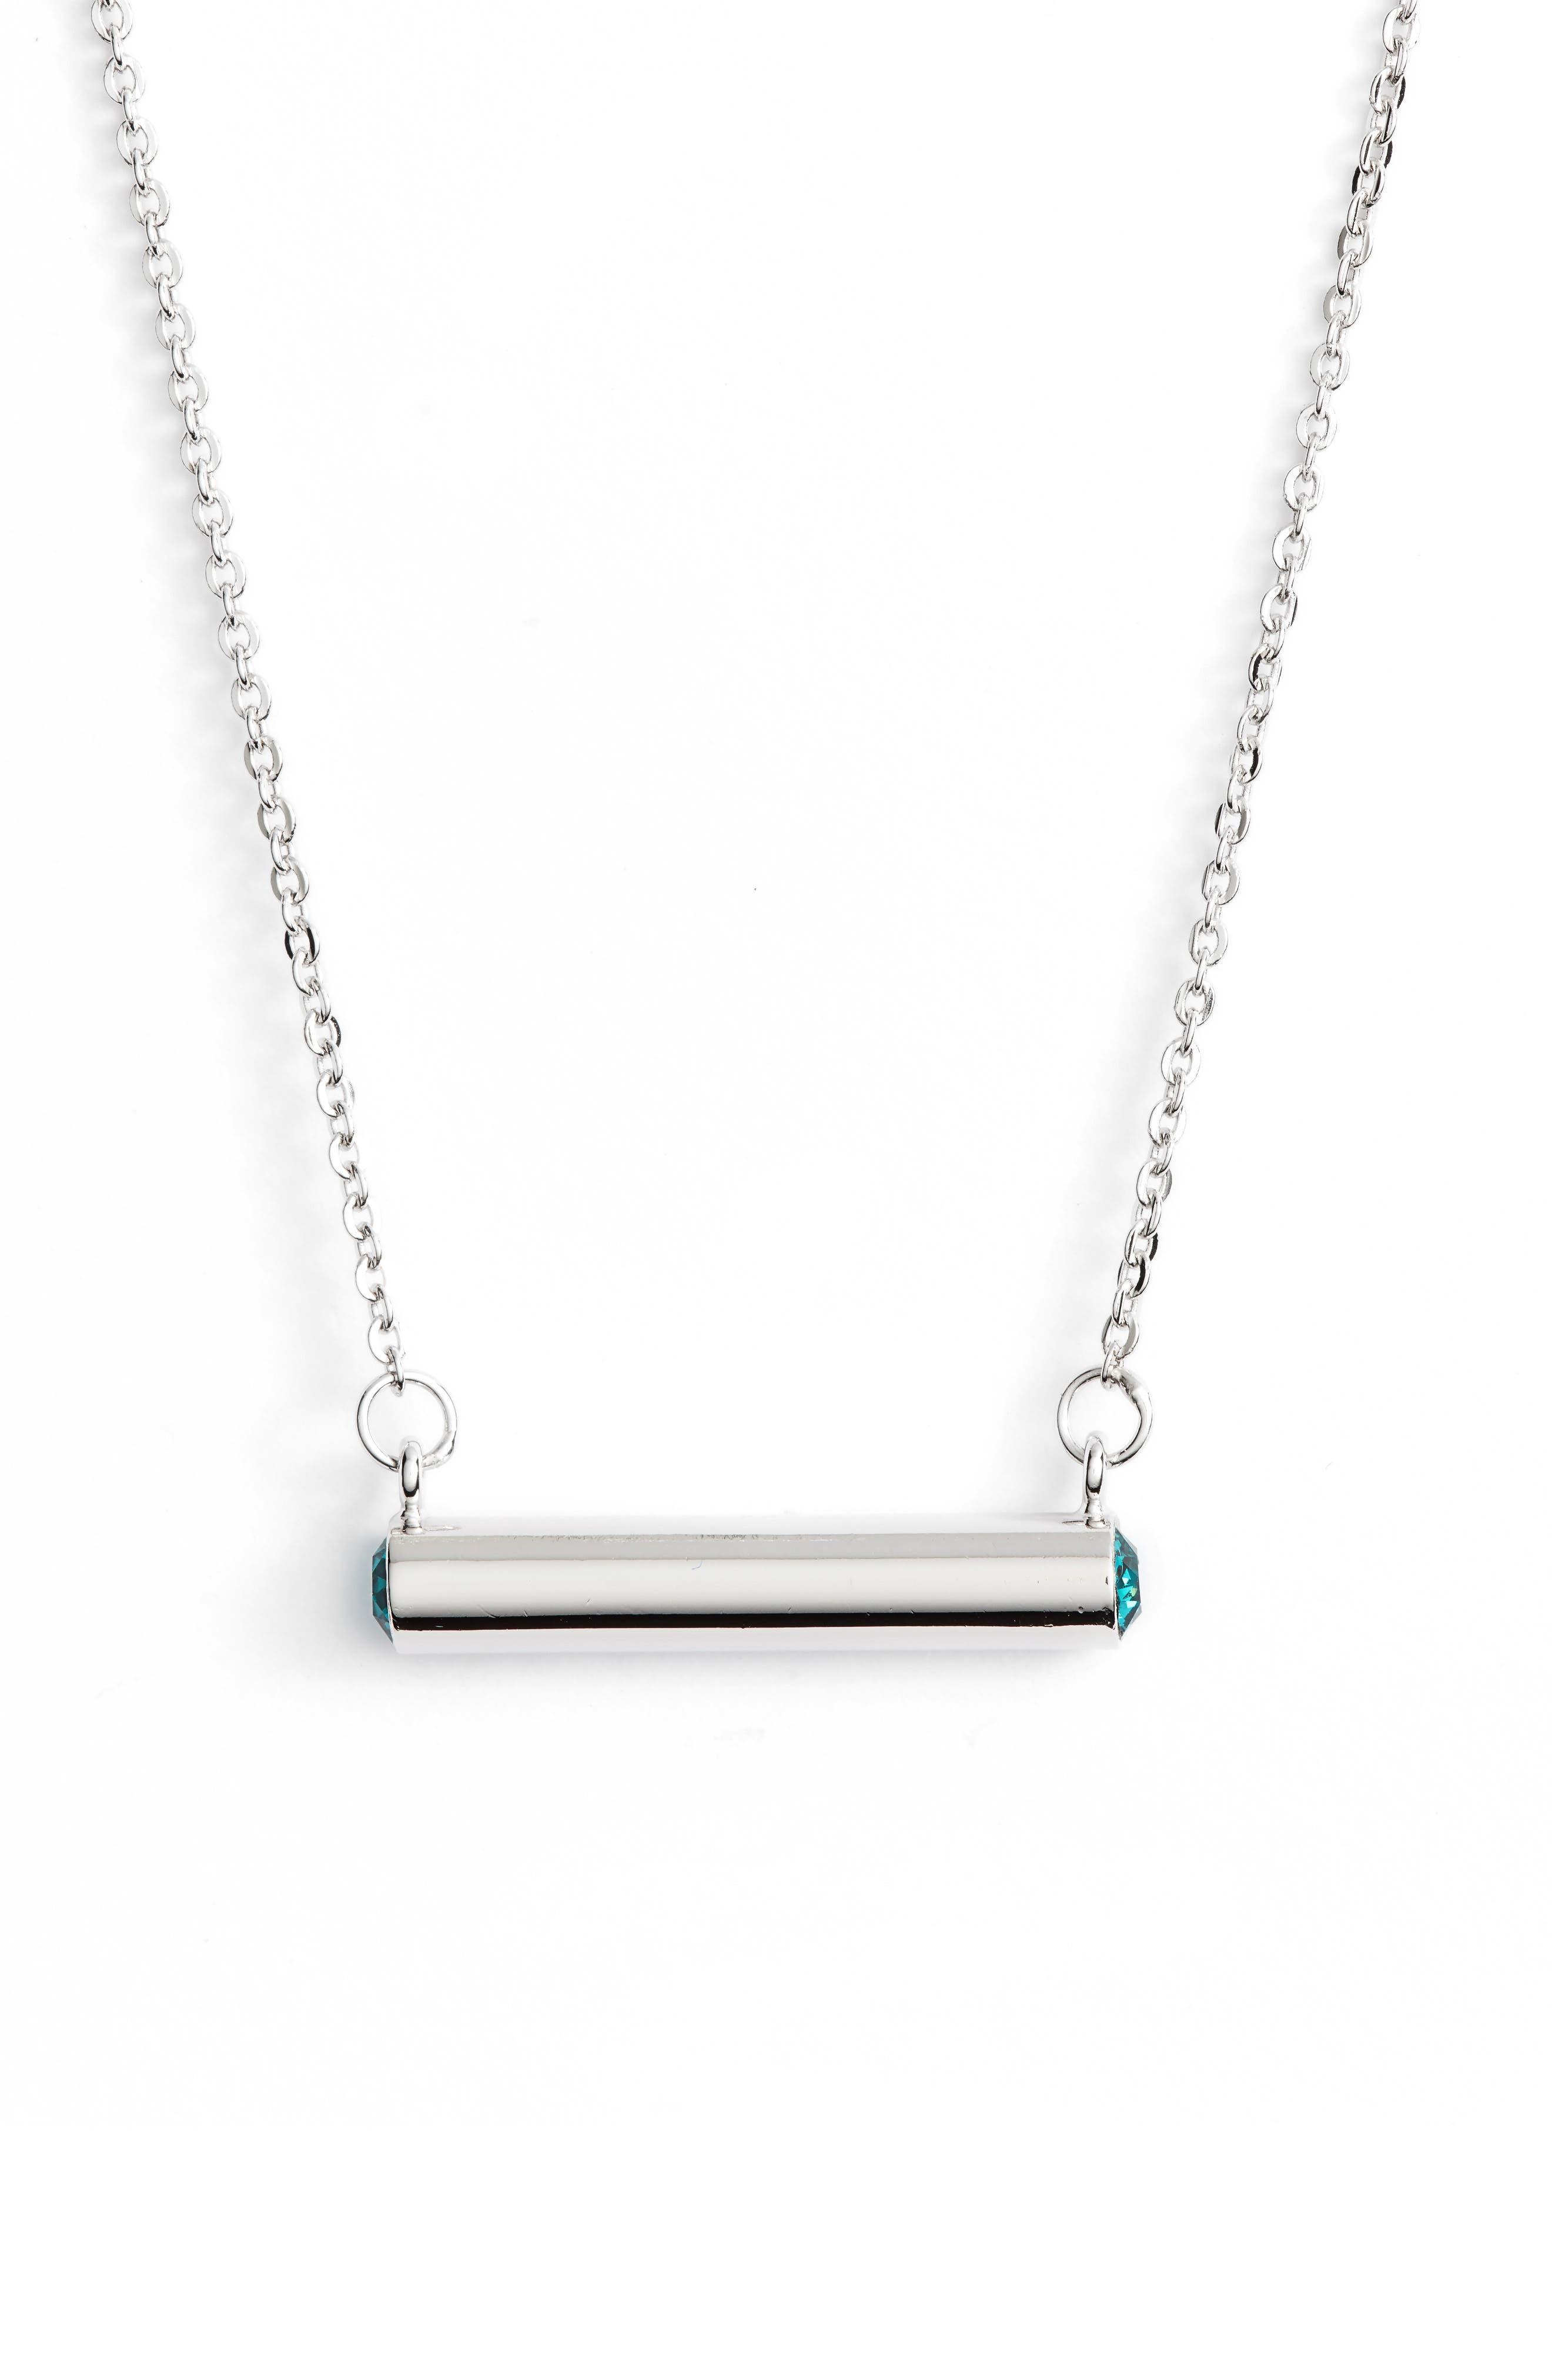 Stella Valle December Crystal Bar Pendant Necklace